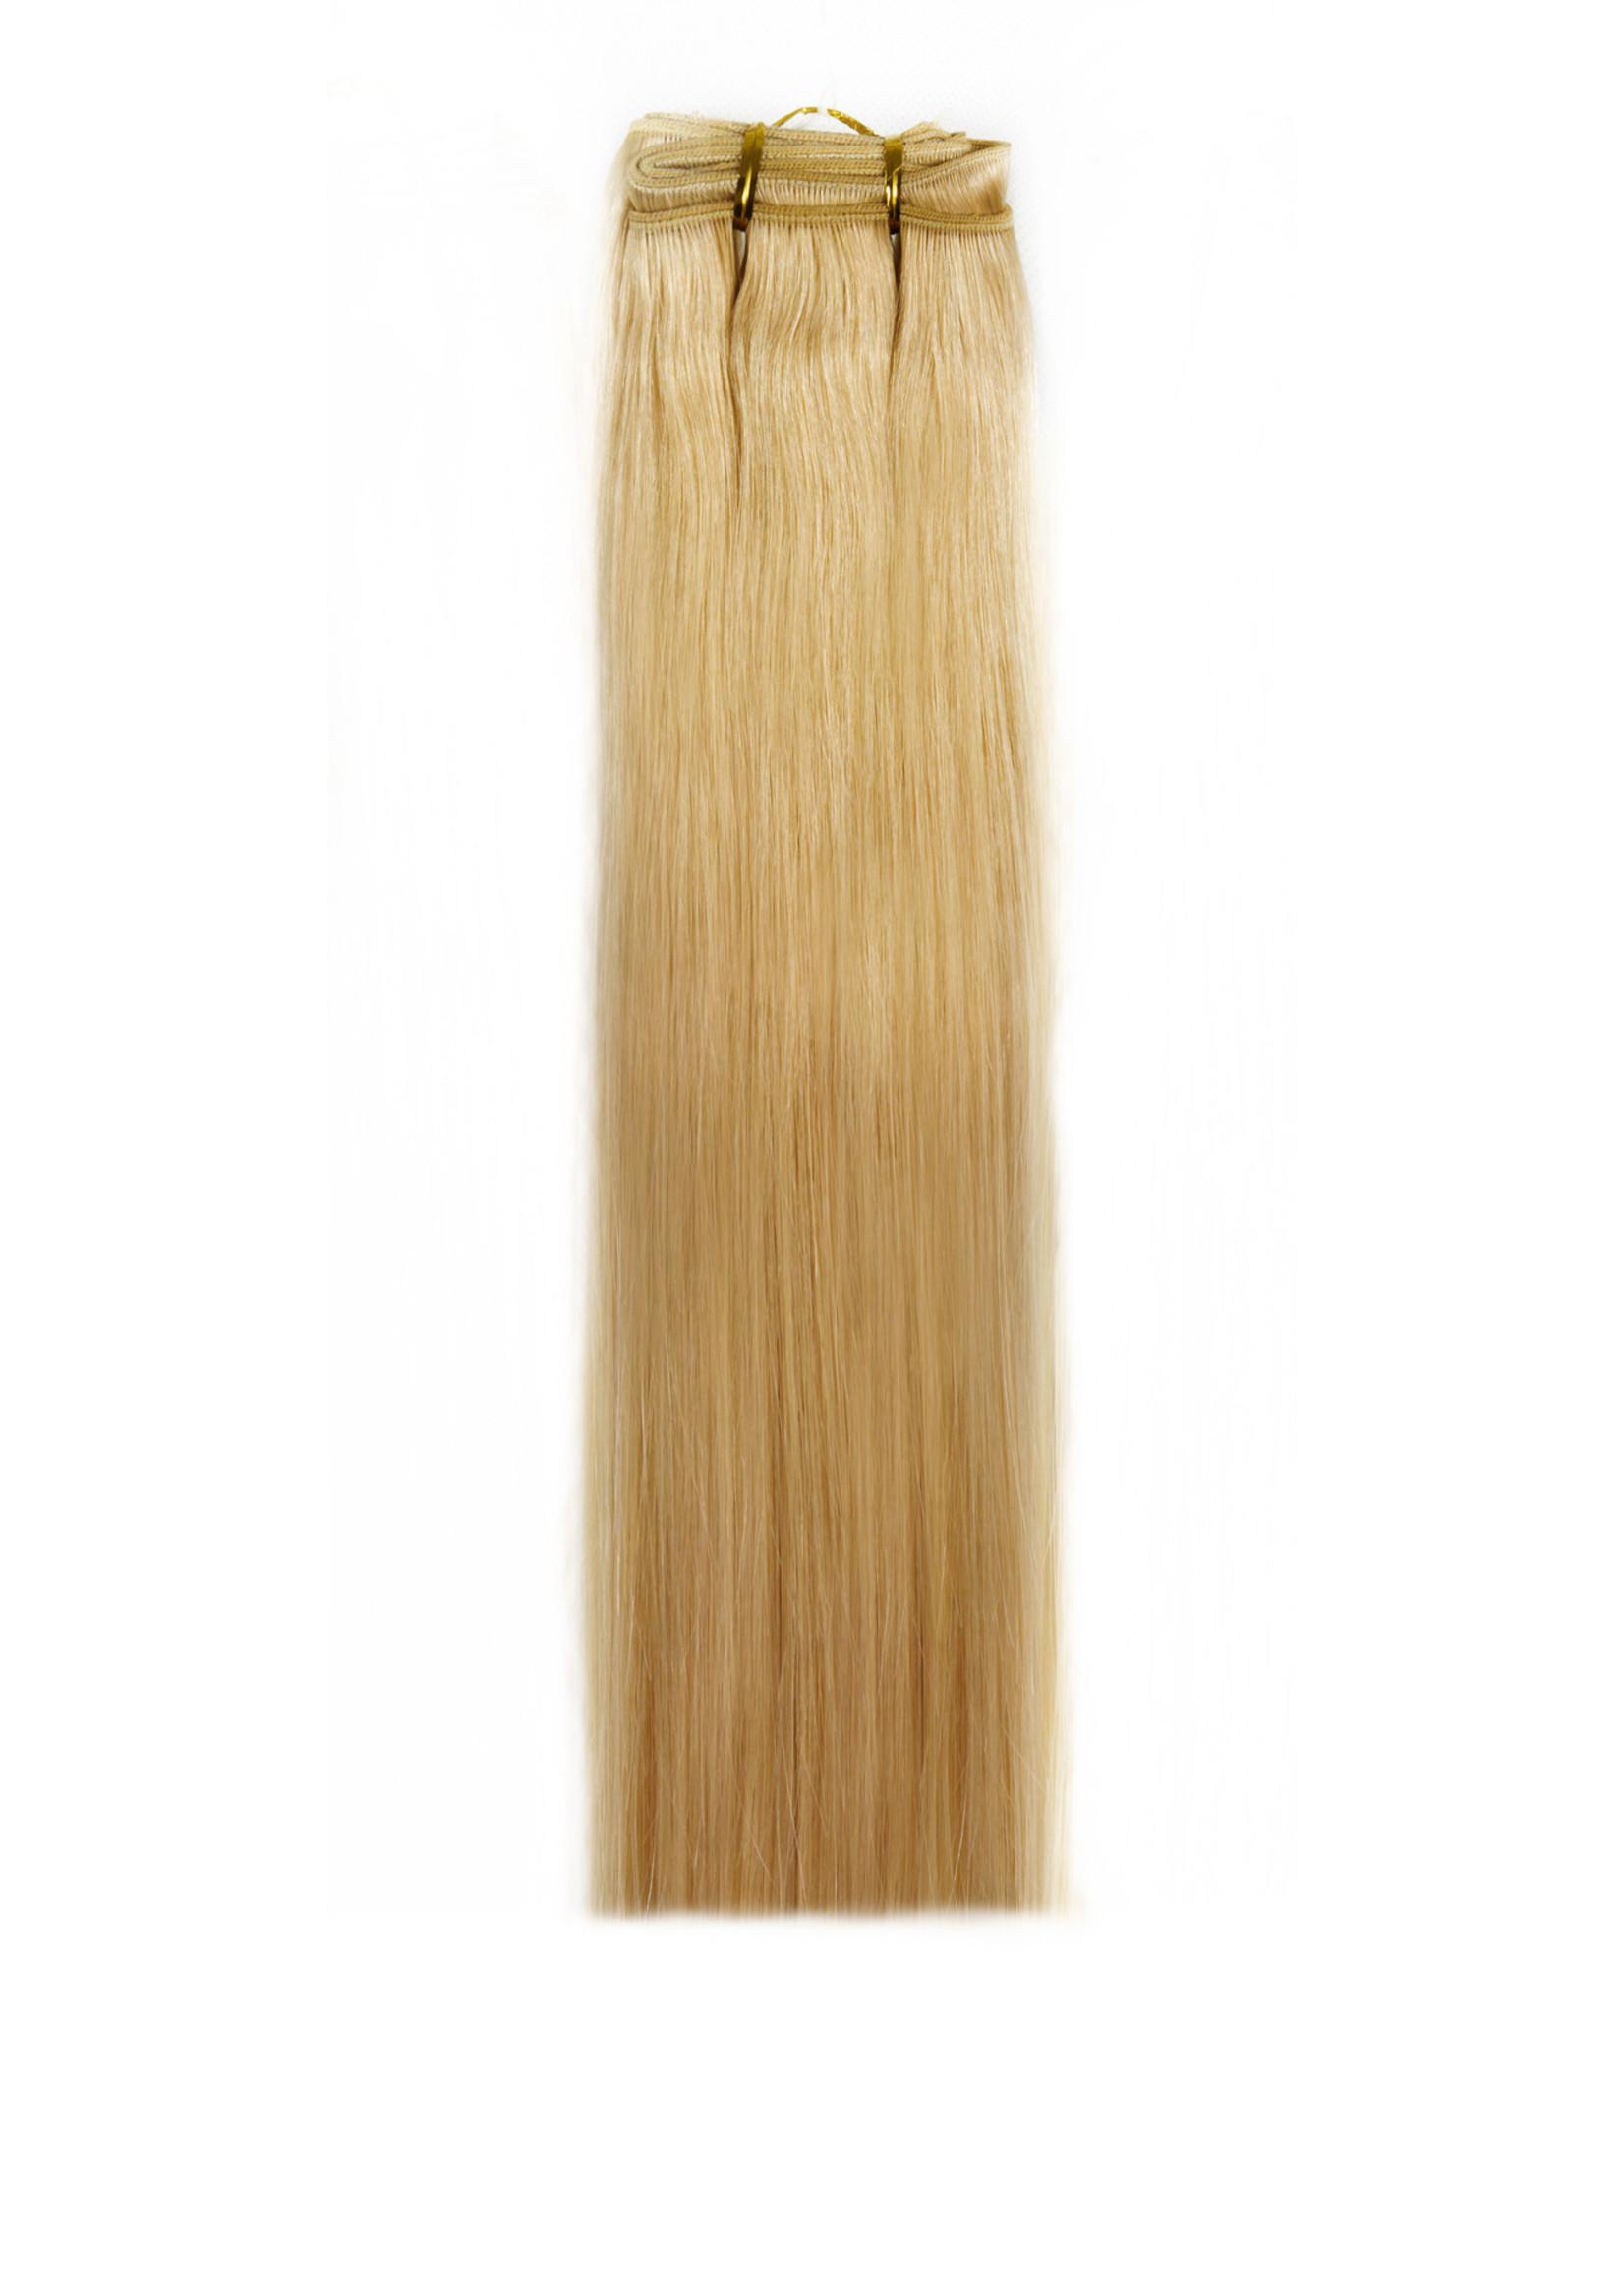 SHRI Indian (Shri) Hair weave (Steil) - #22 Hollywood Blonde